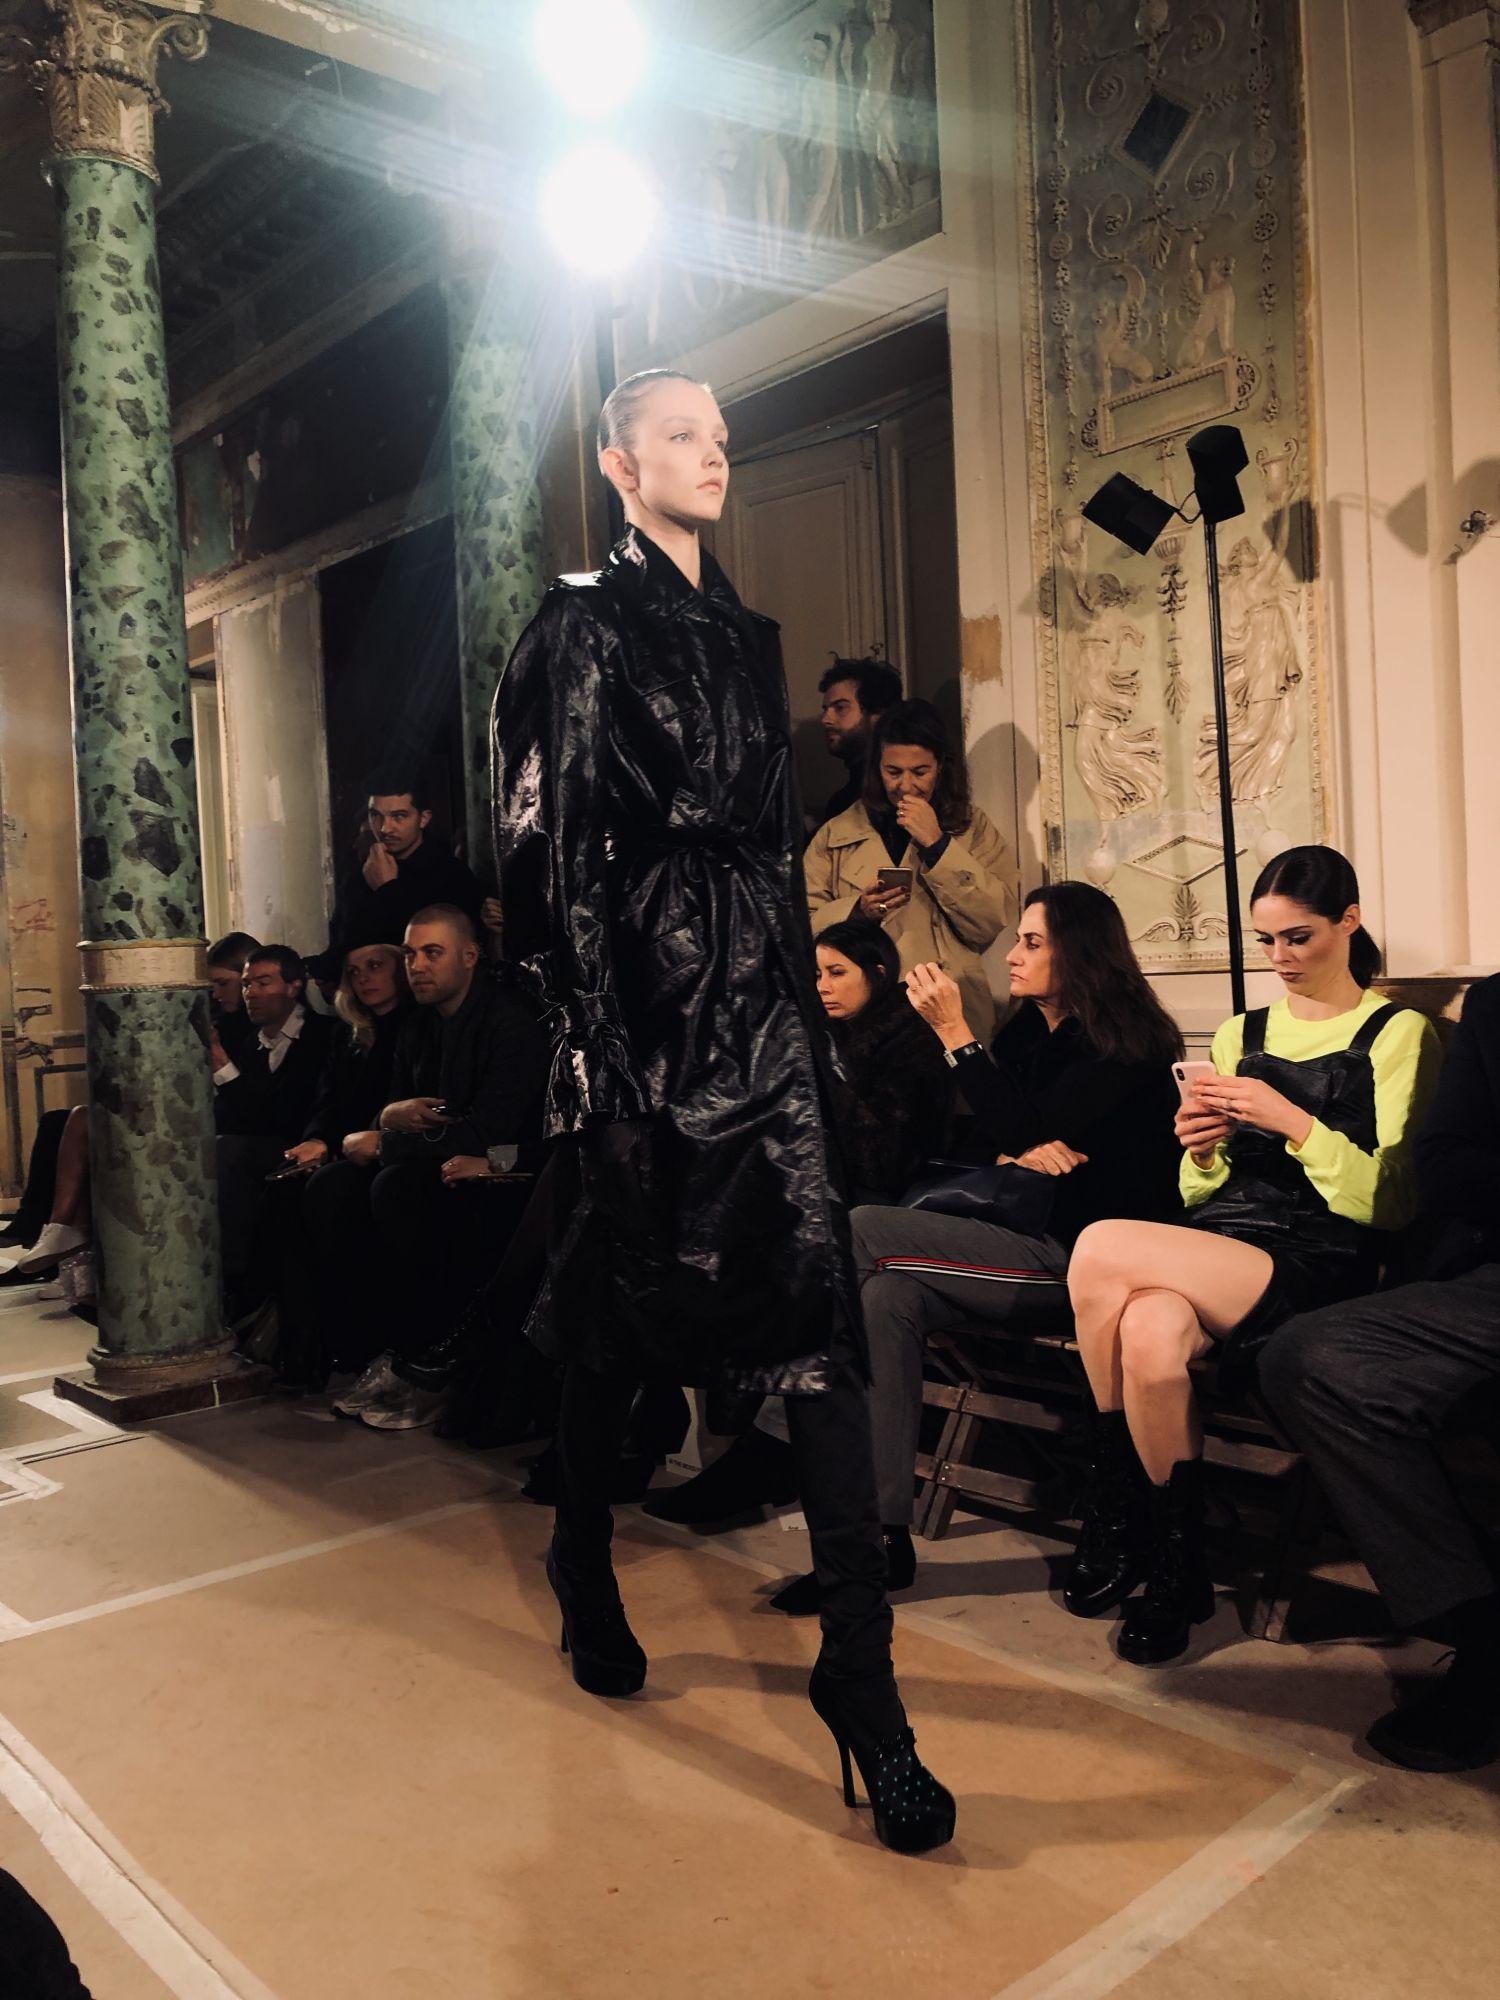 Paris Fashion Week Autumn/Winter 2019: Day 4 Highlights